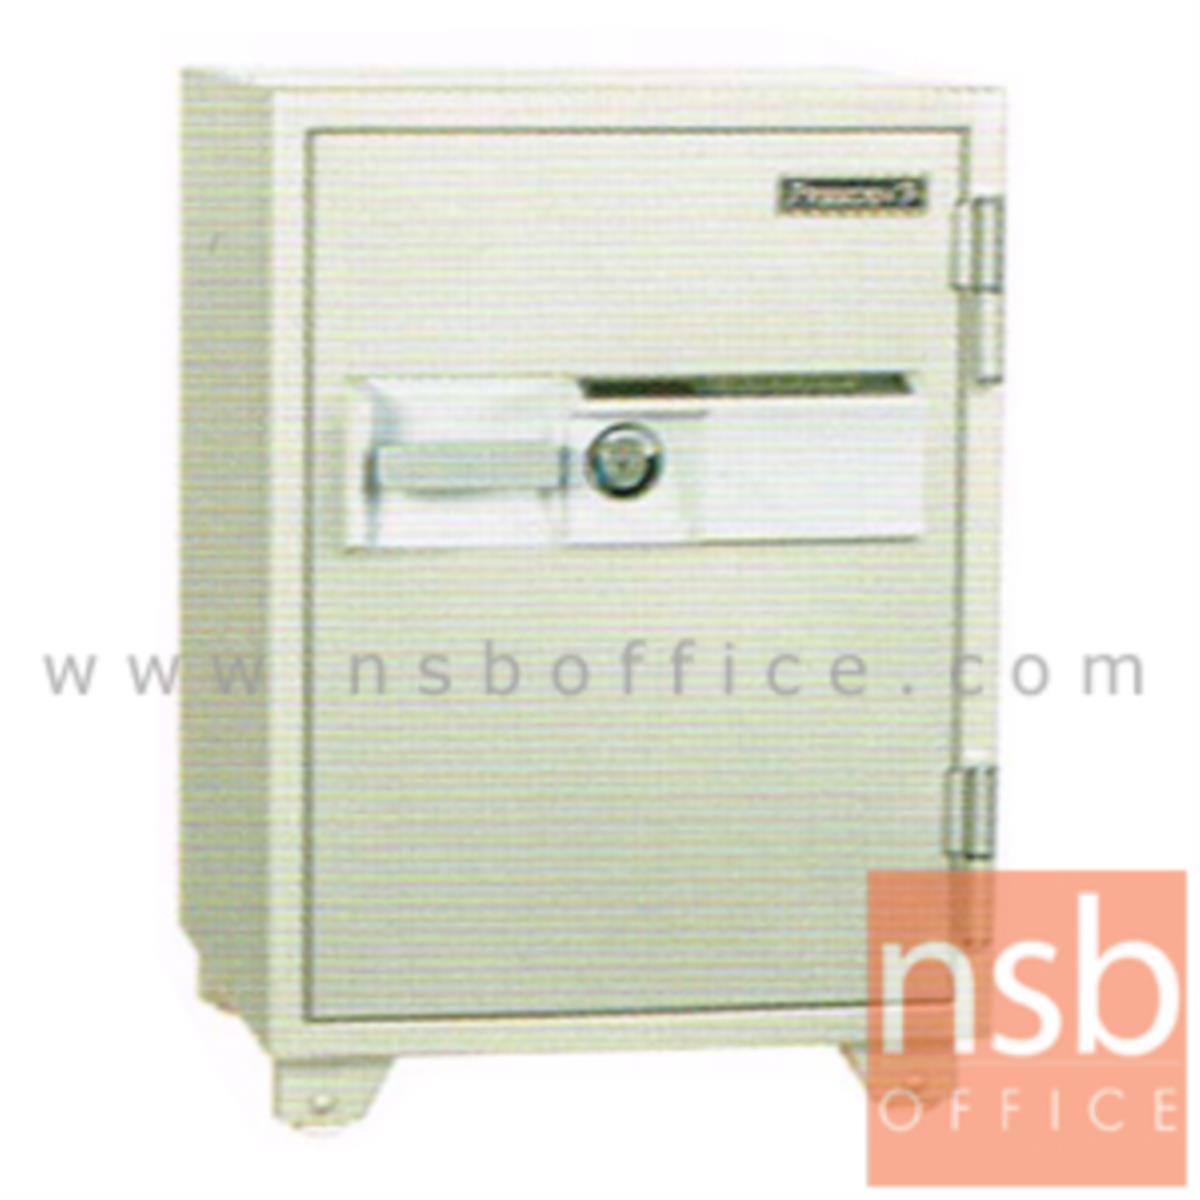 F05A056:ตู้เซฟดิจิตอล 105 กก. รุ่น PRESIDENT-SMD2  มี 1 กุญแจ 1 รหัส  (รหัสใช้กดหน้าตู้ )